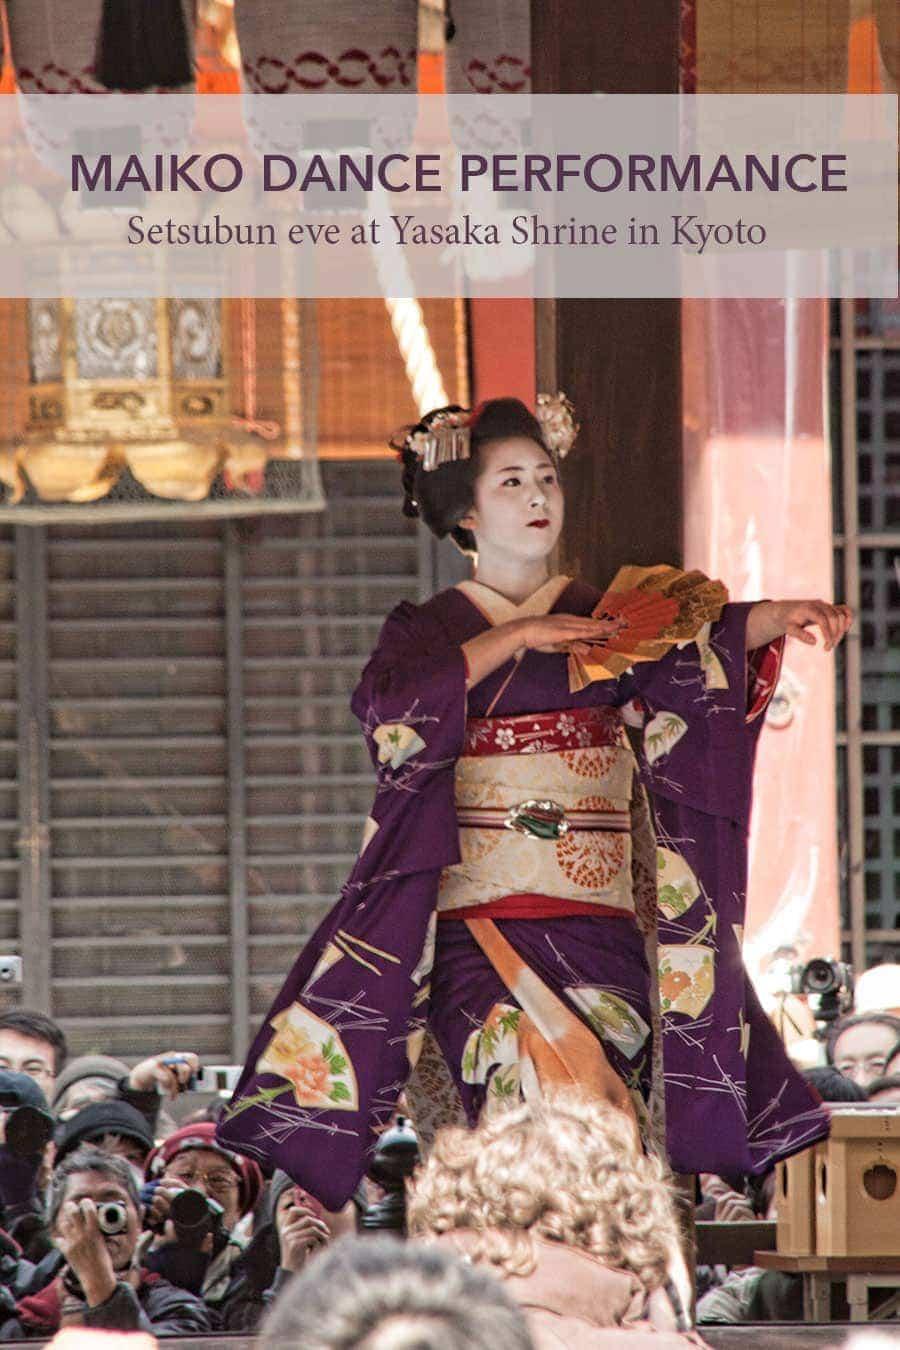 Maiko dance for Setsubun at the Shrine